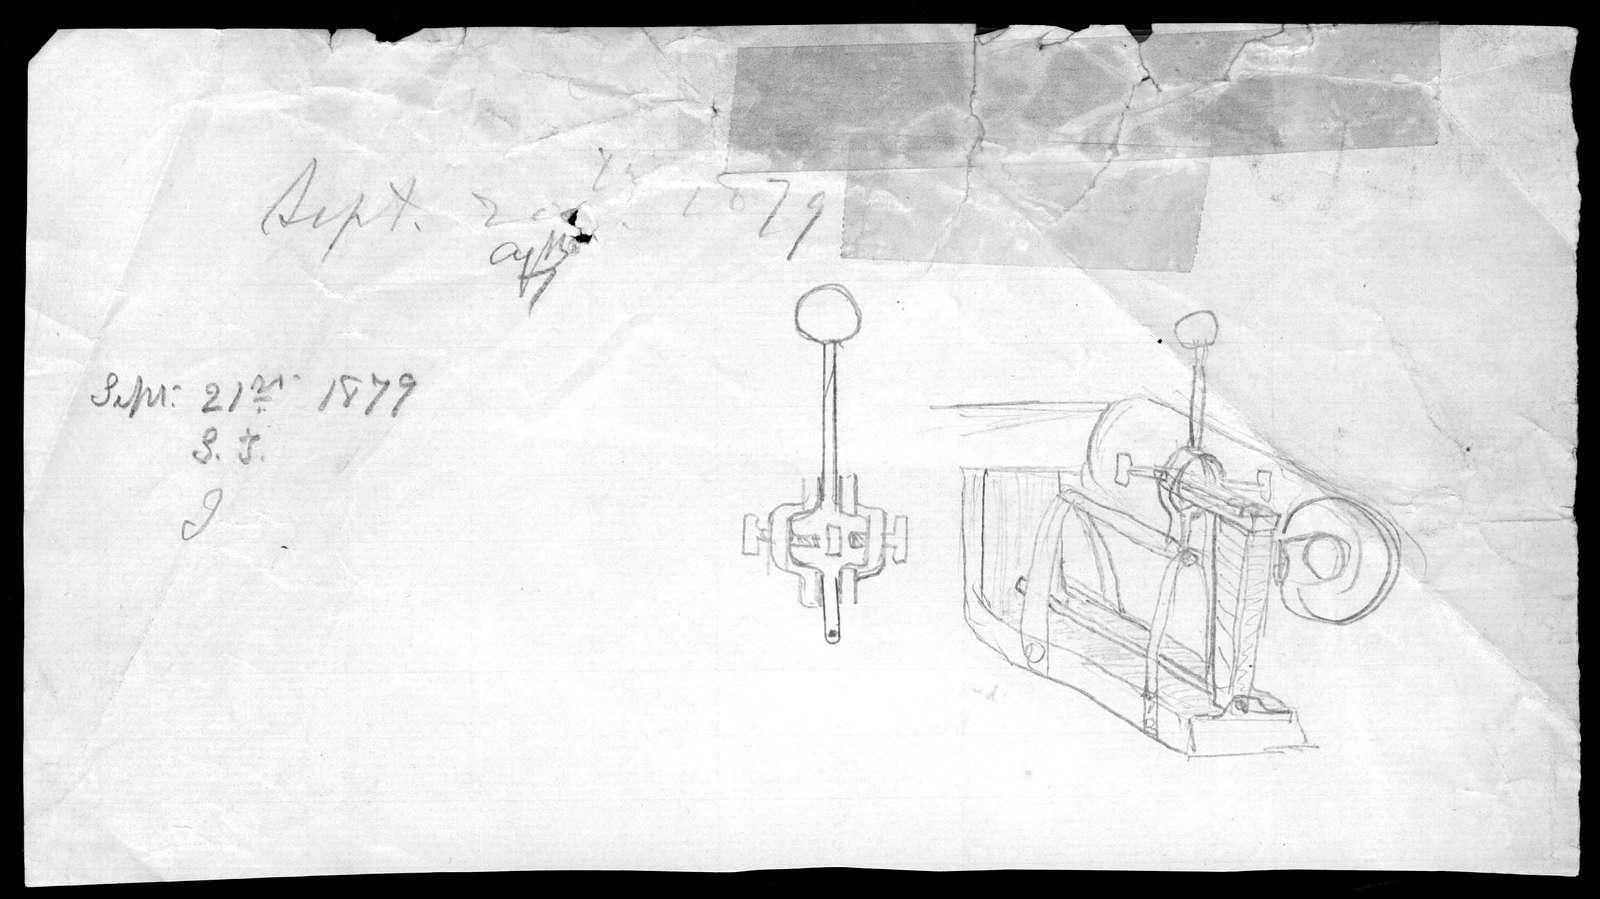 Drawing by Alexander Graham Bell, September 20, 1879